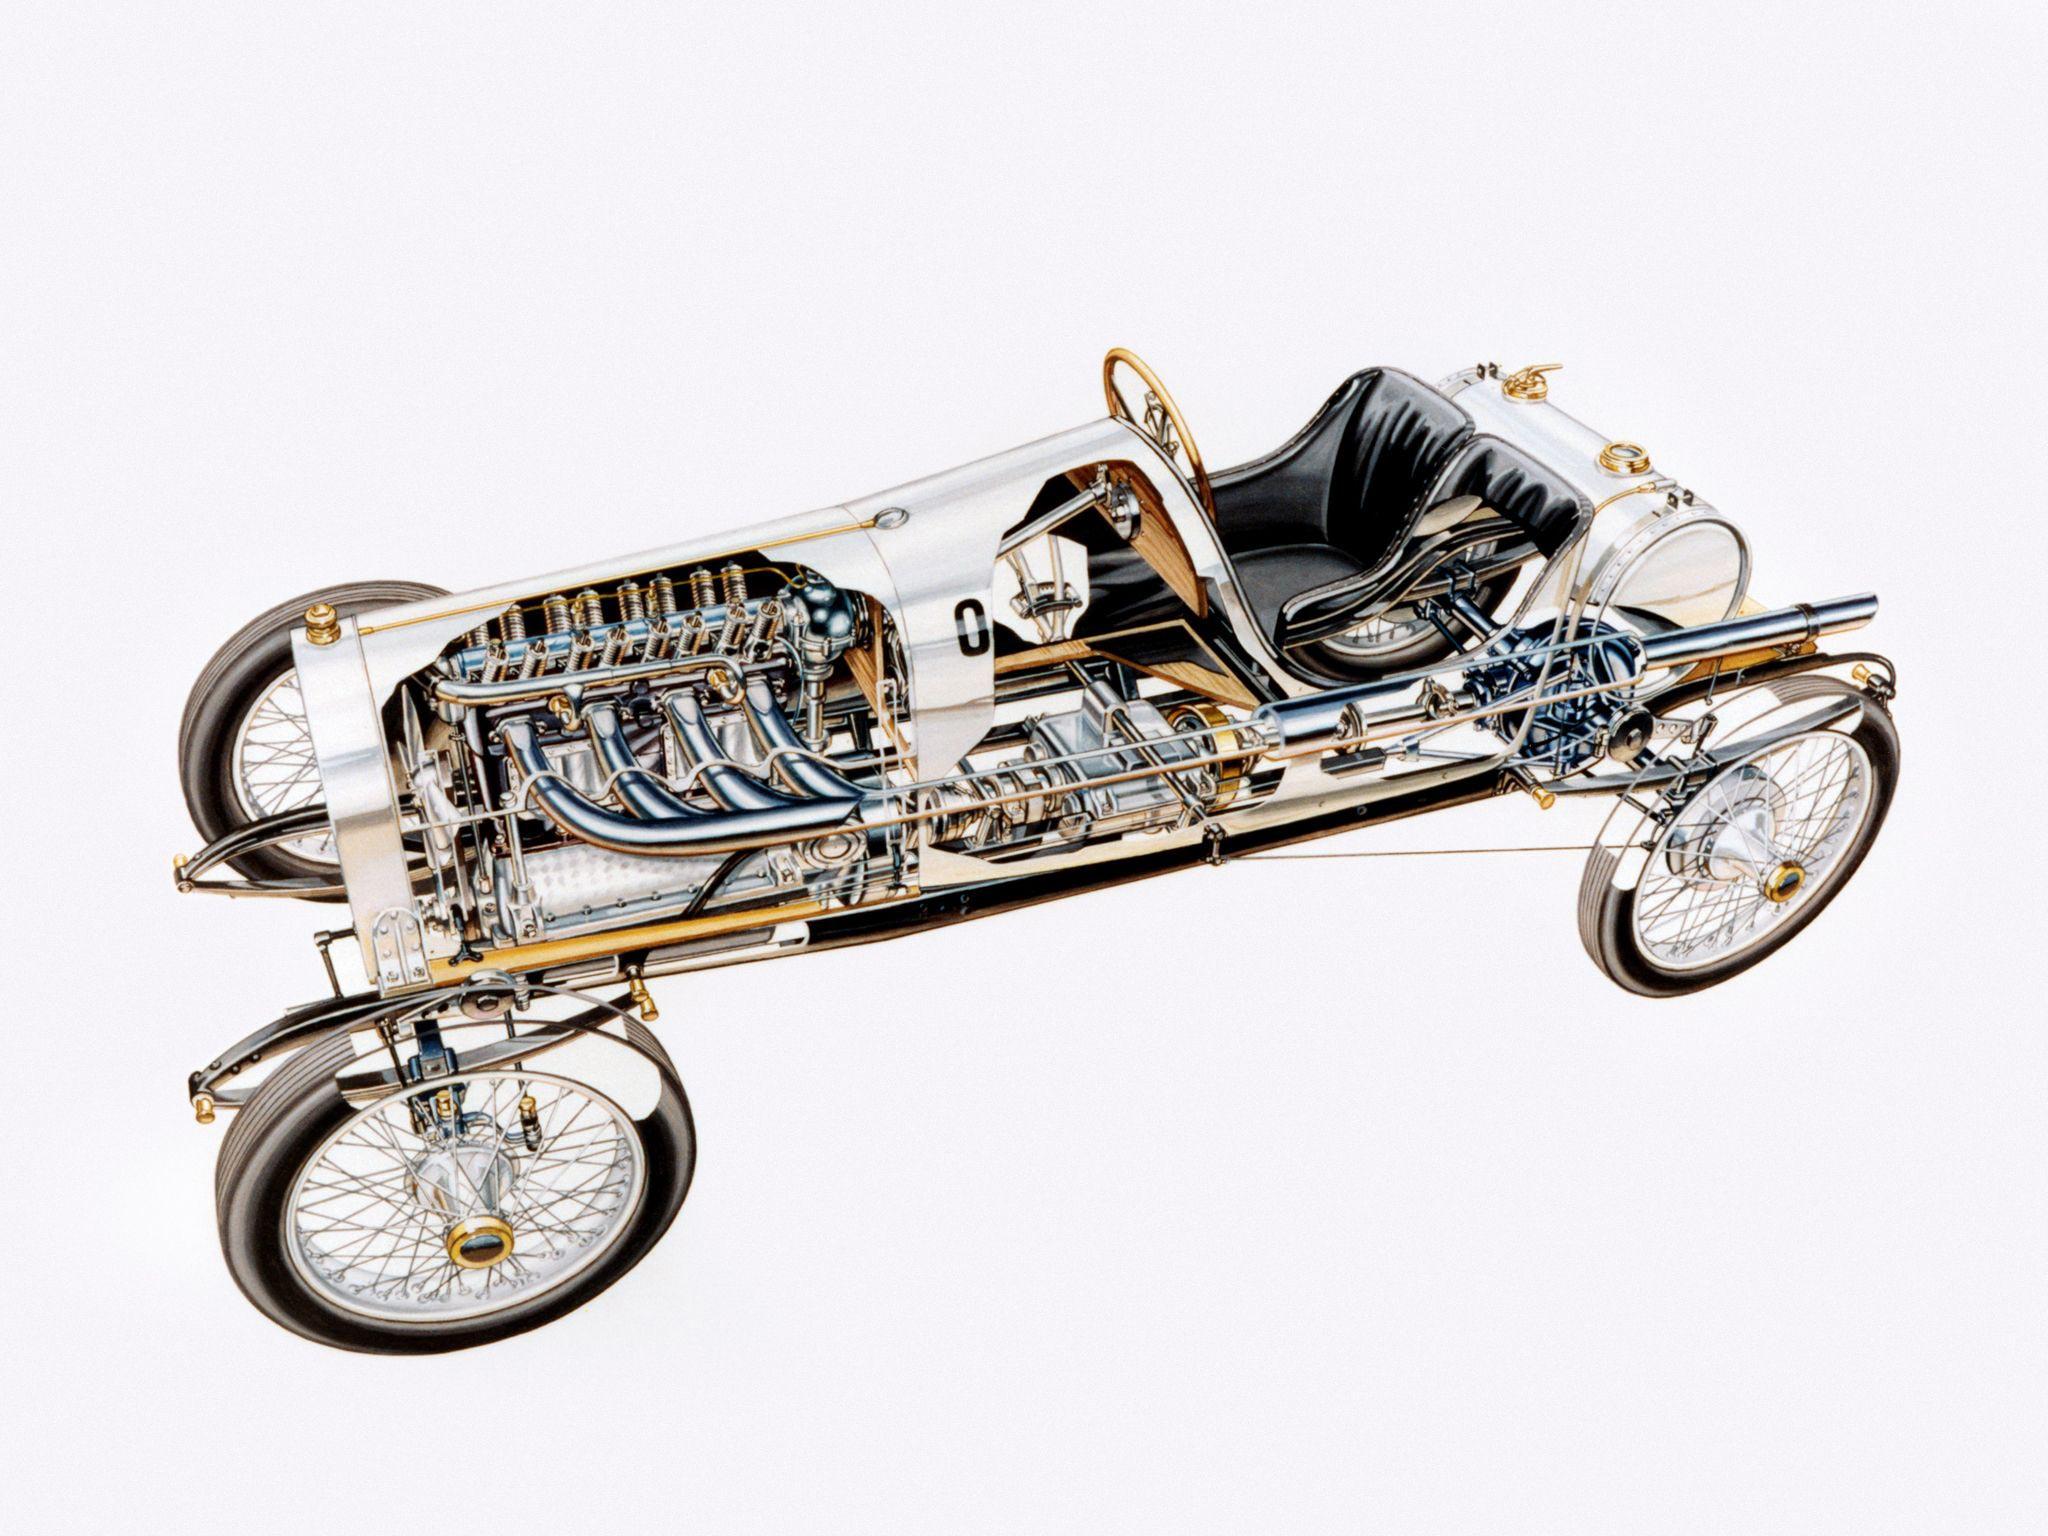 Opel Rennwagen cutaway drawing